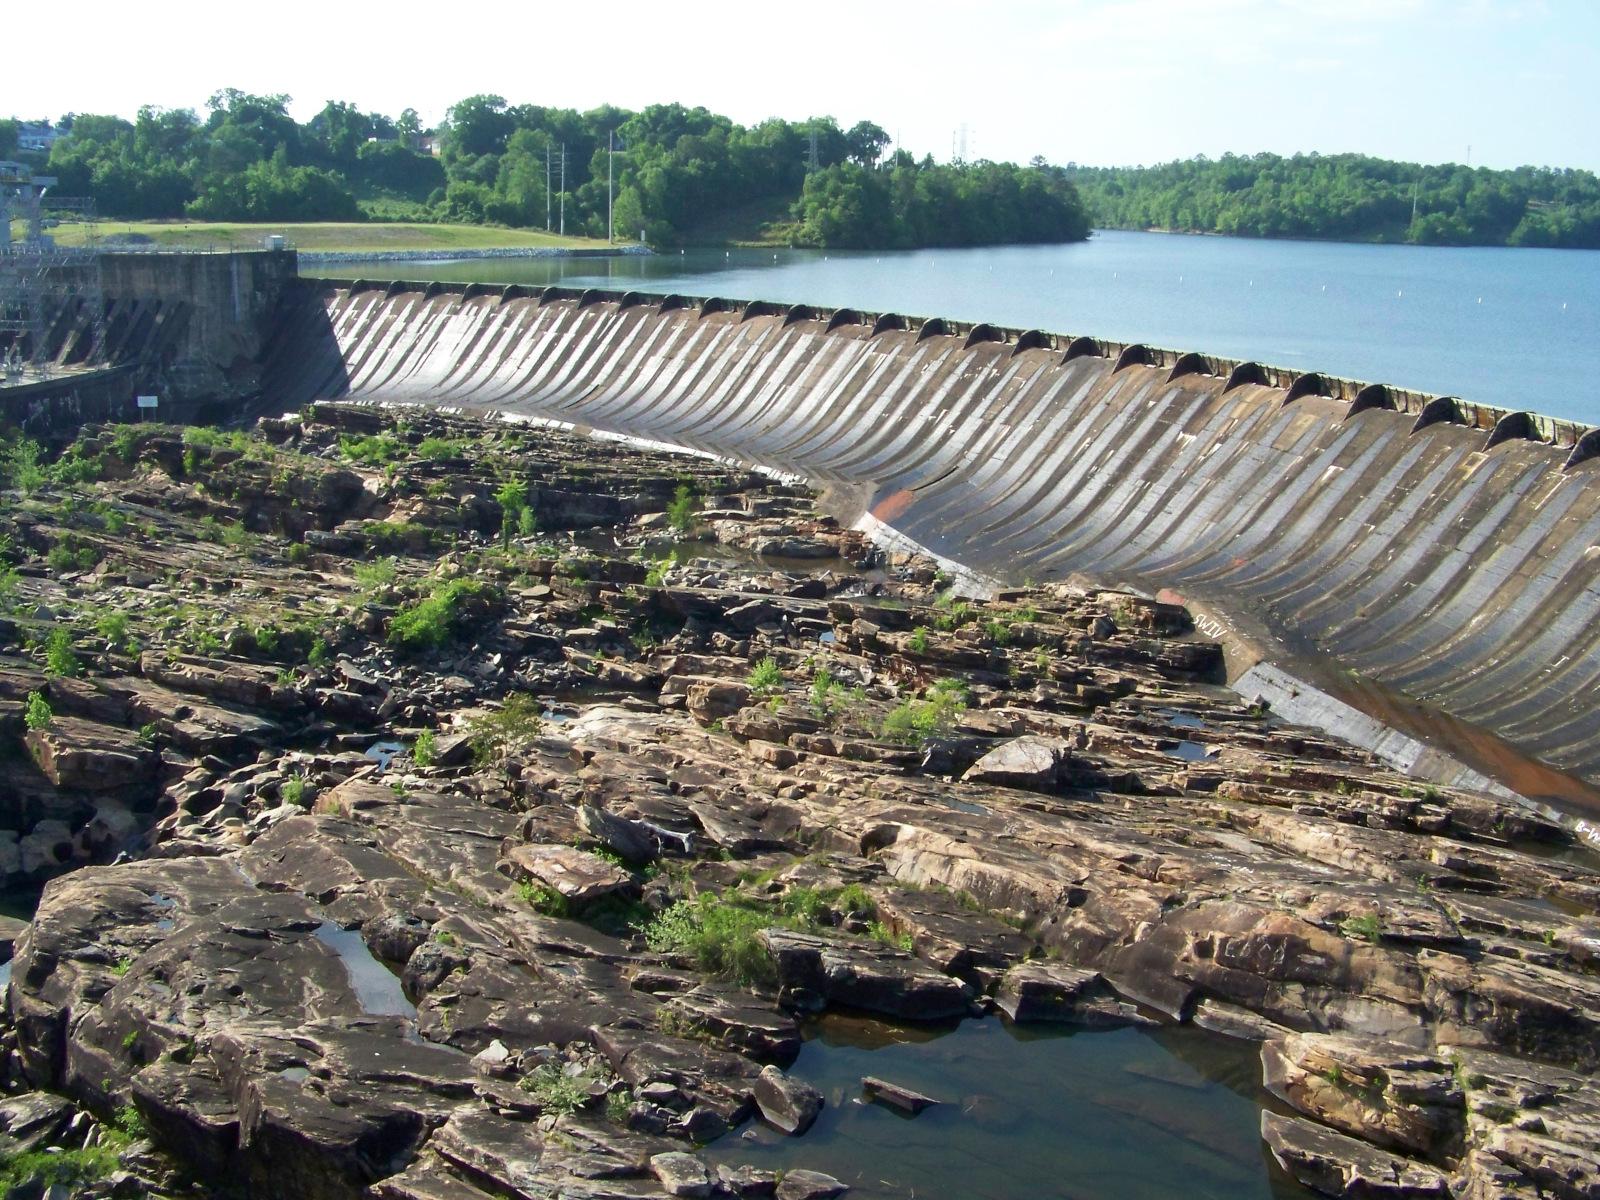 Thurlow Dam face